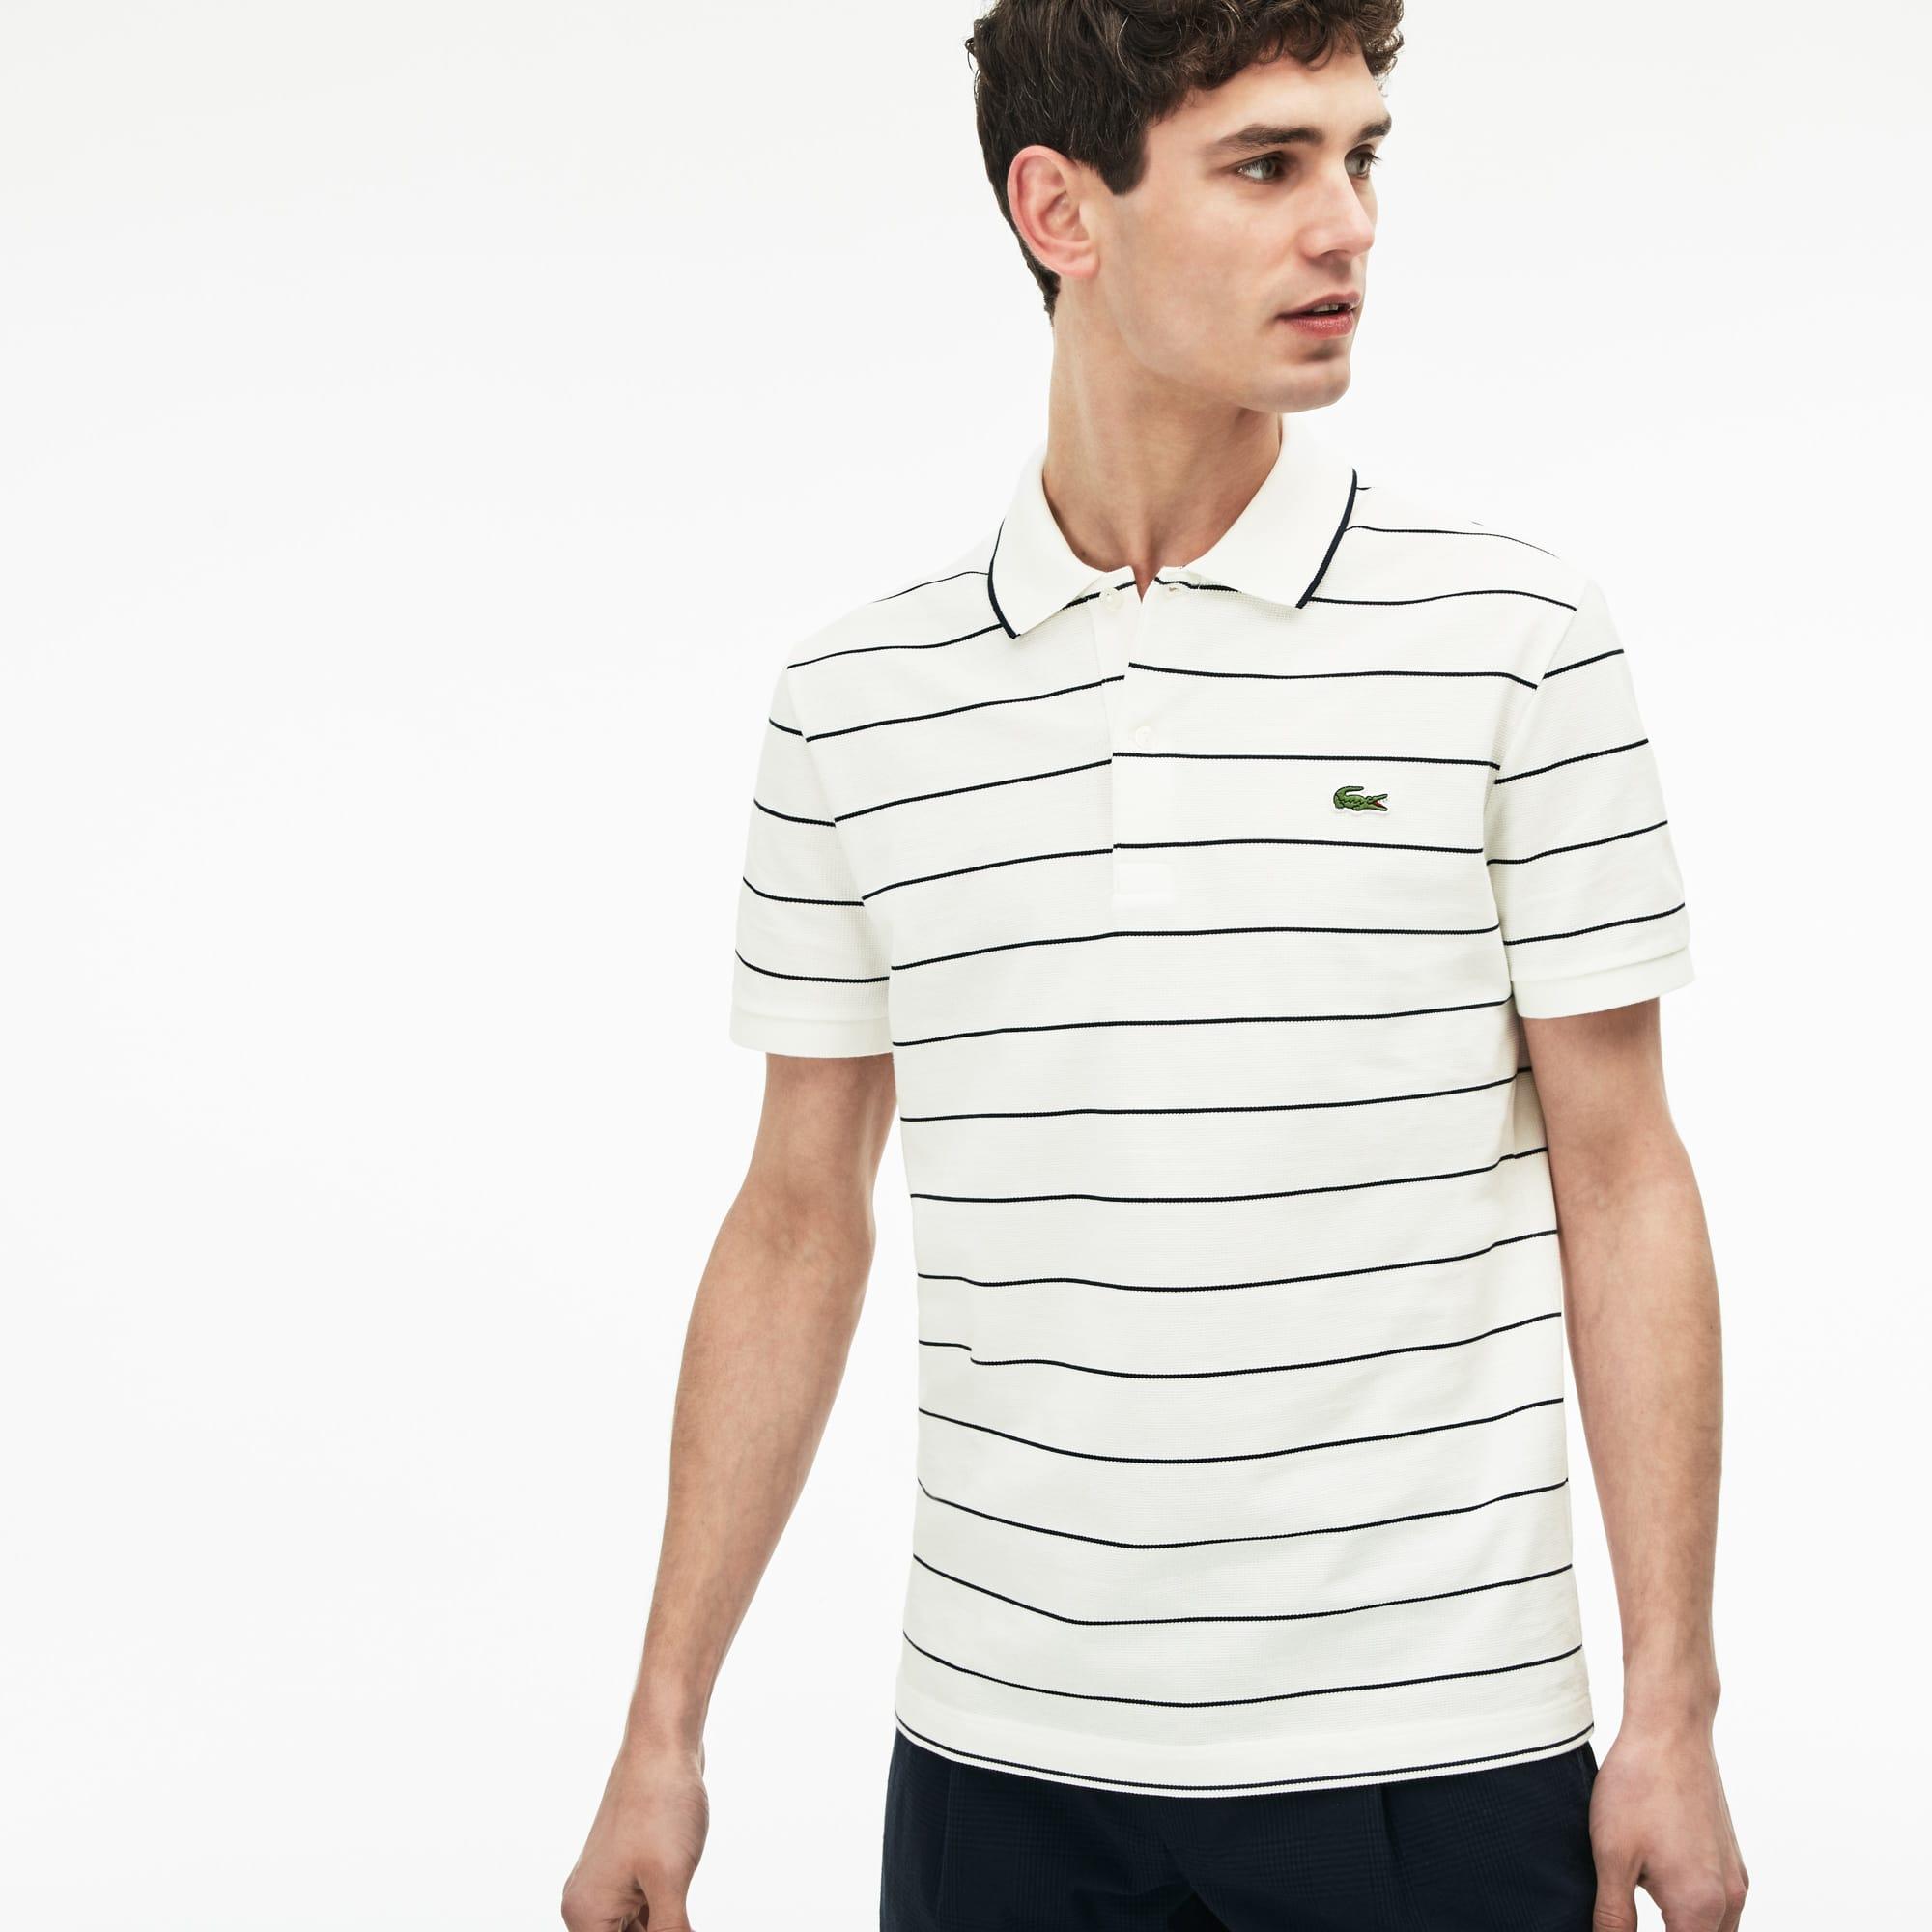 b4d4177471c Camisa Polo Lacoste Slim Fit Masculina Listrada e Debruada em Jérsei e Malha